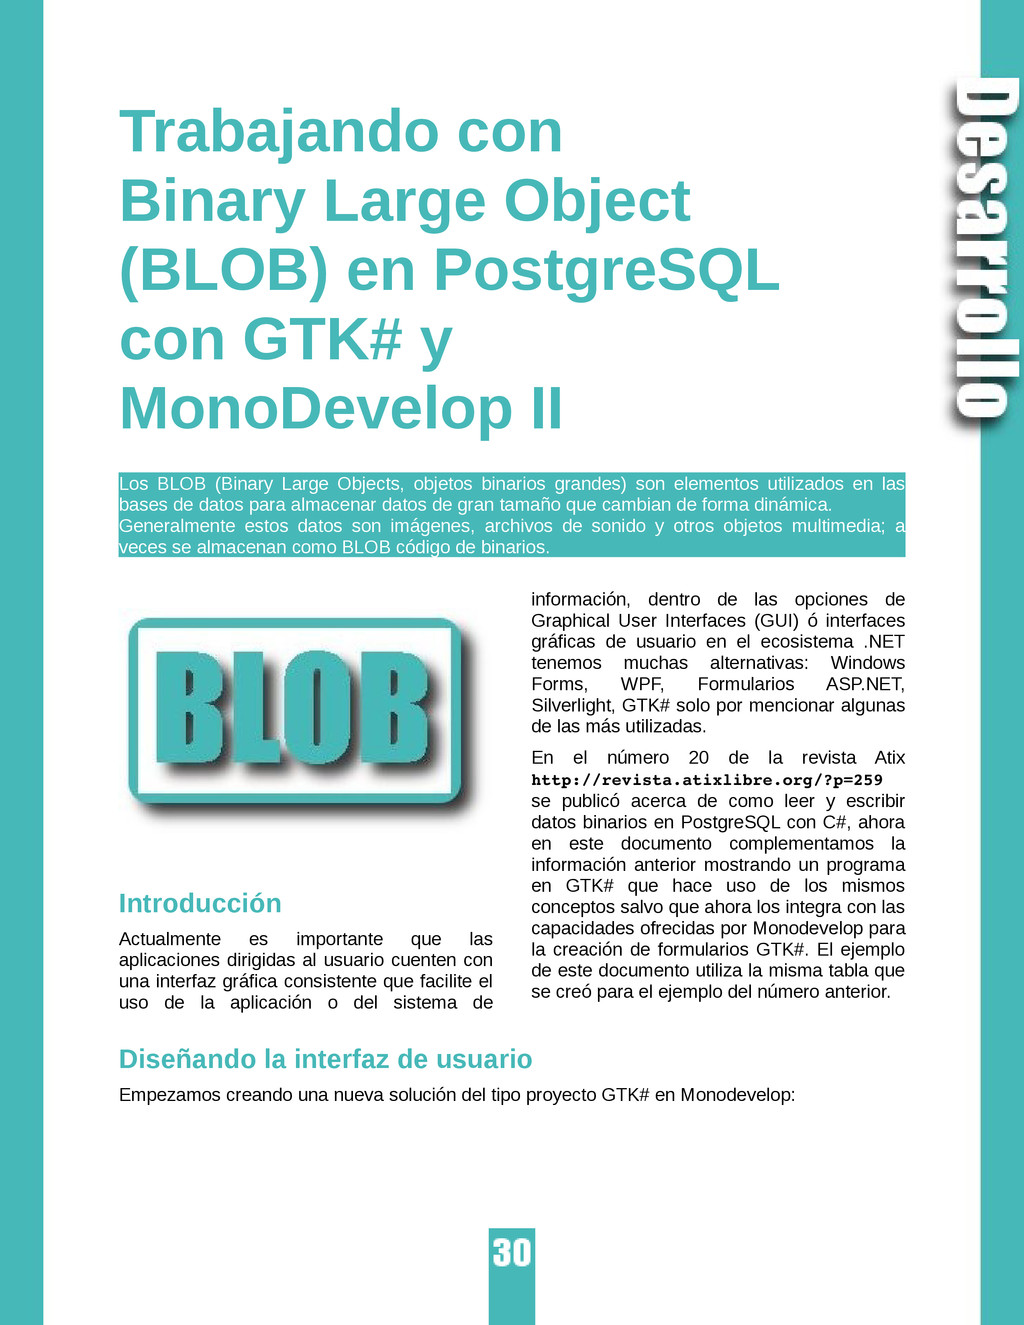 Trabajando con Binary Large Object (BLOB) en Po...